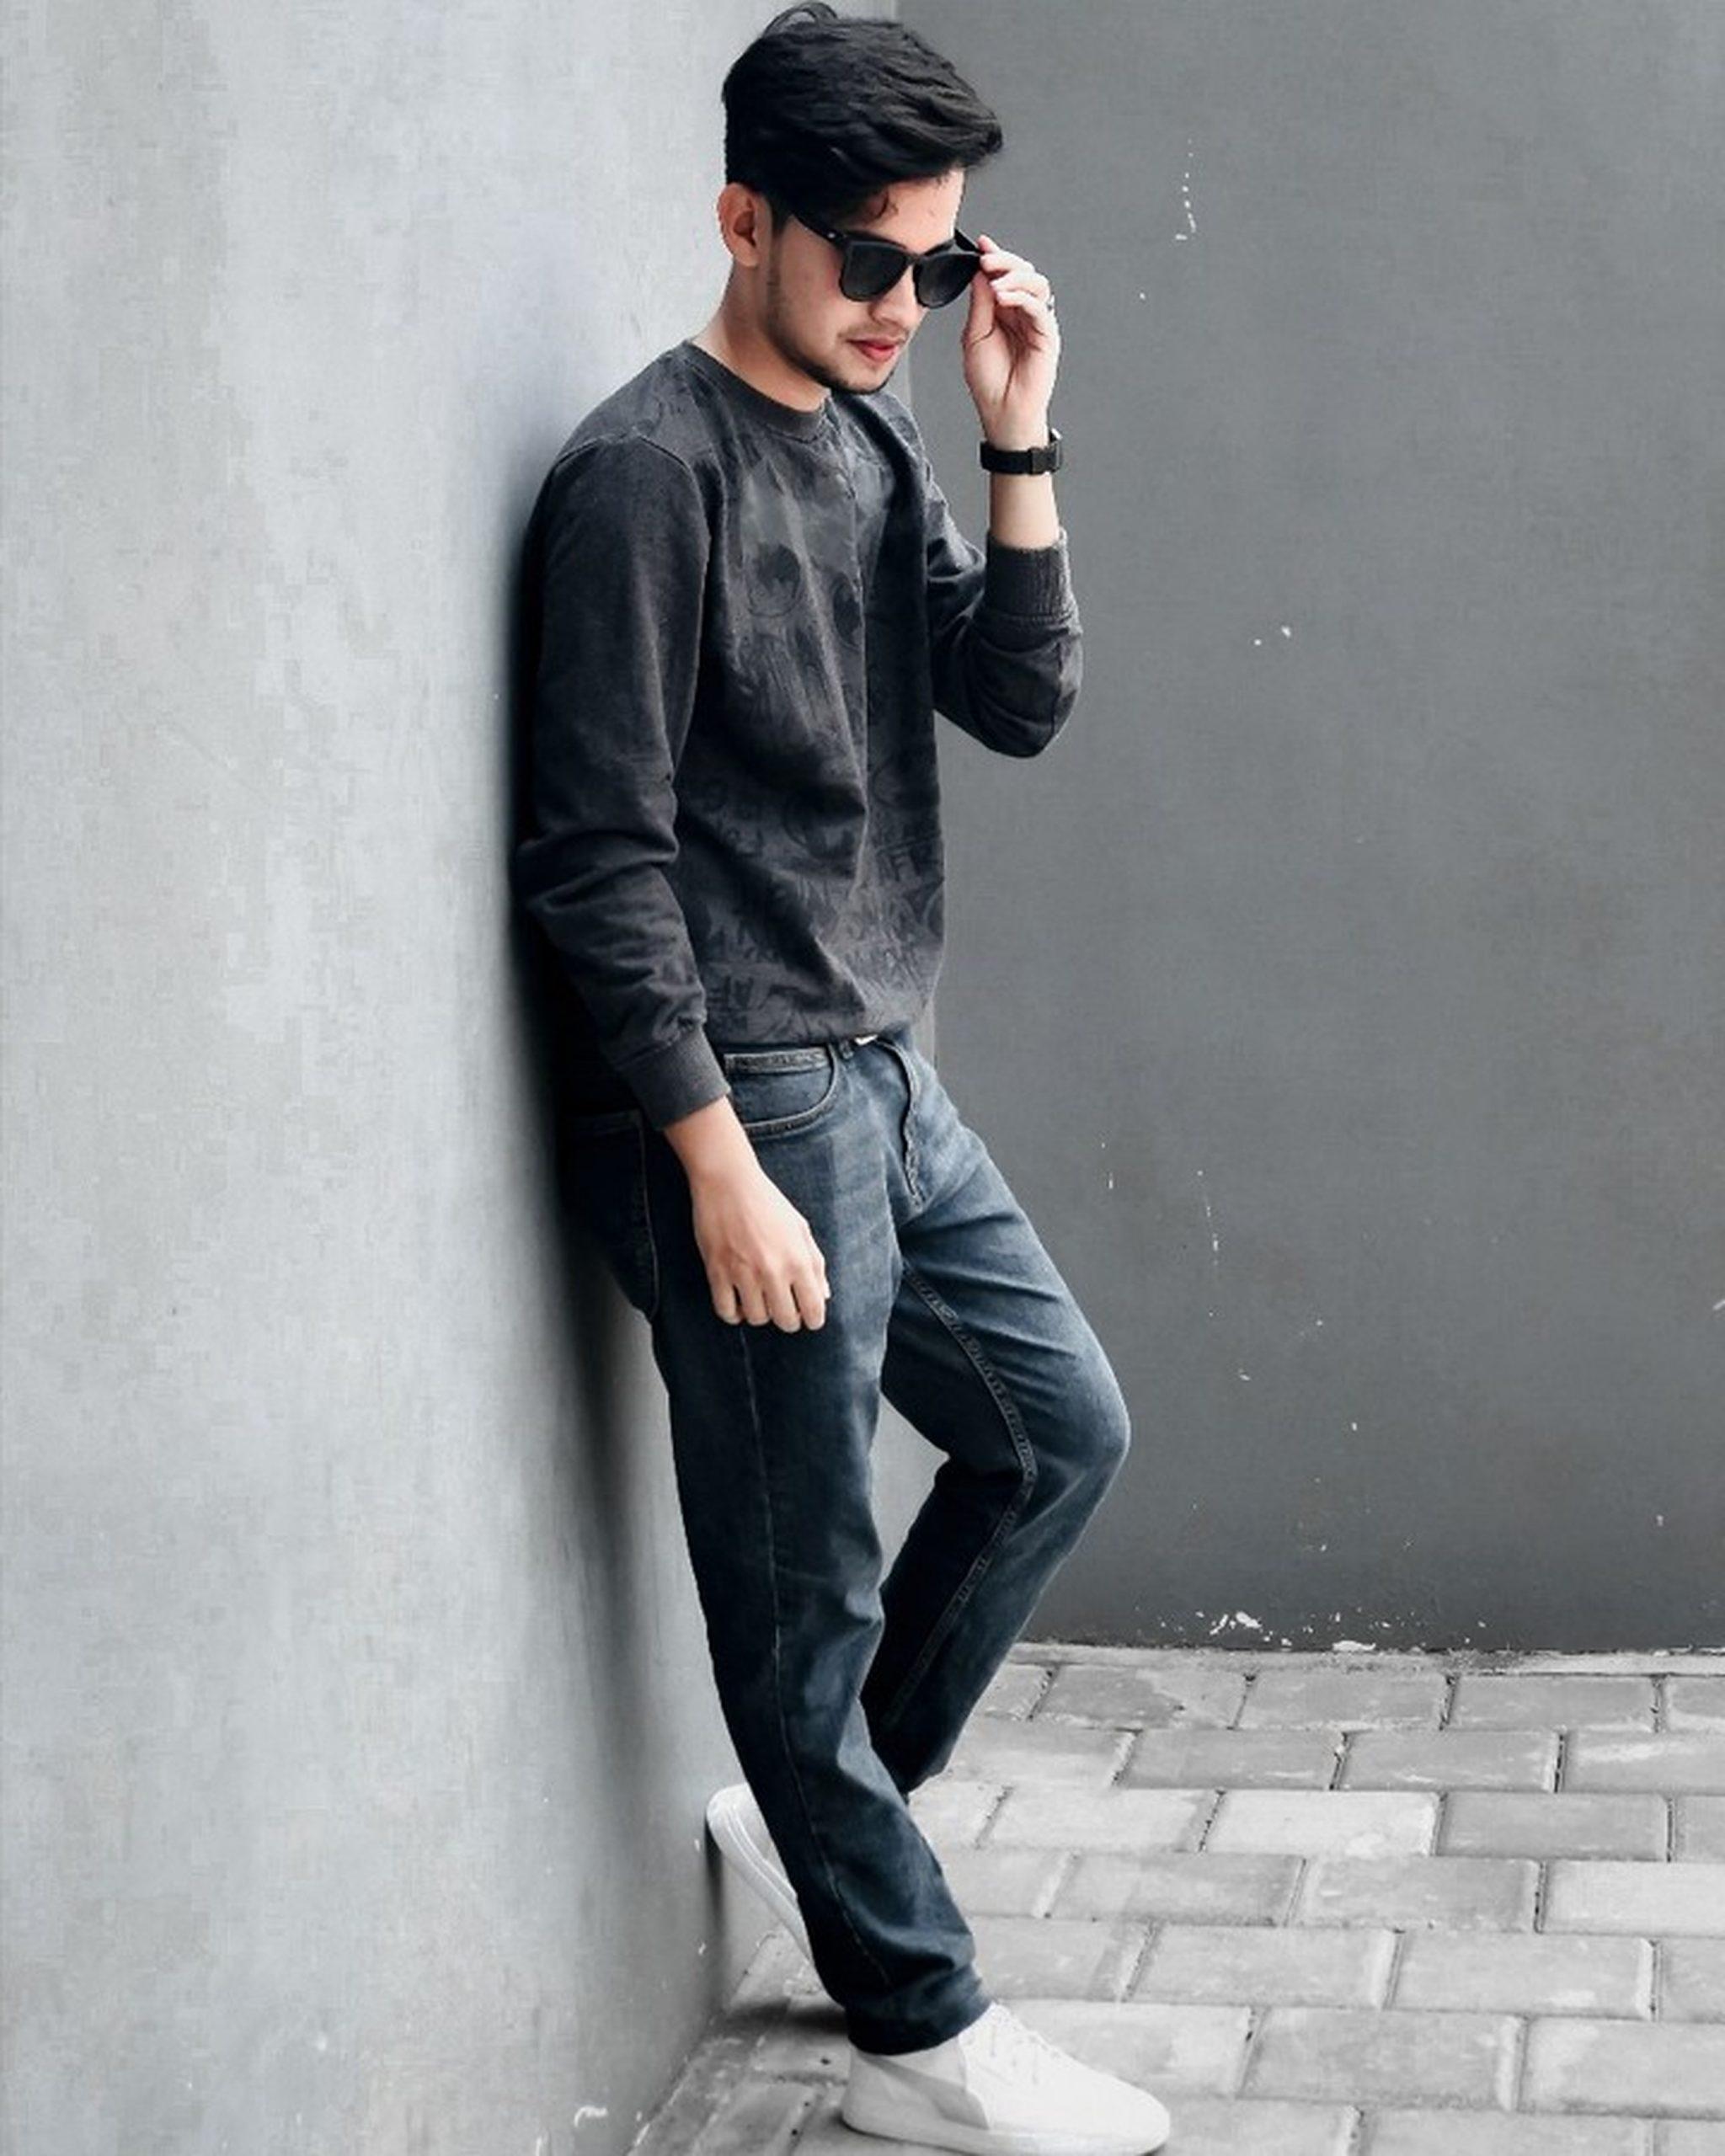 A stylish boy standing against a wall